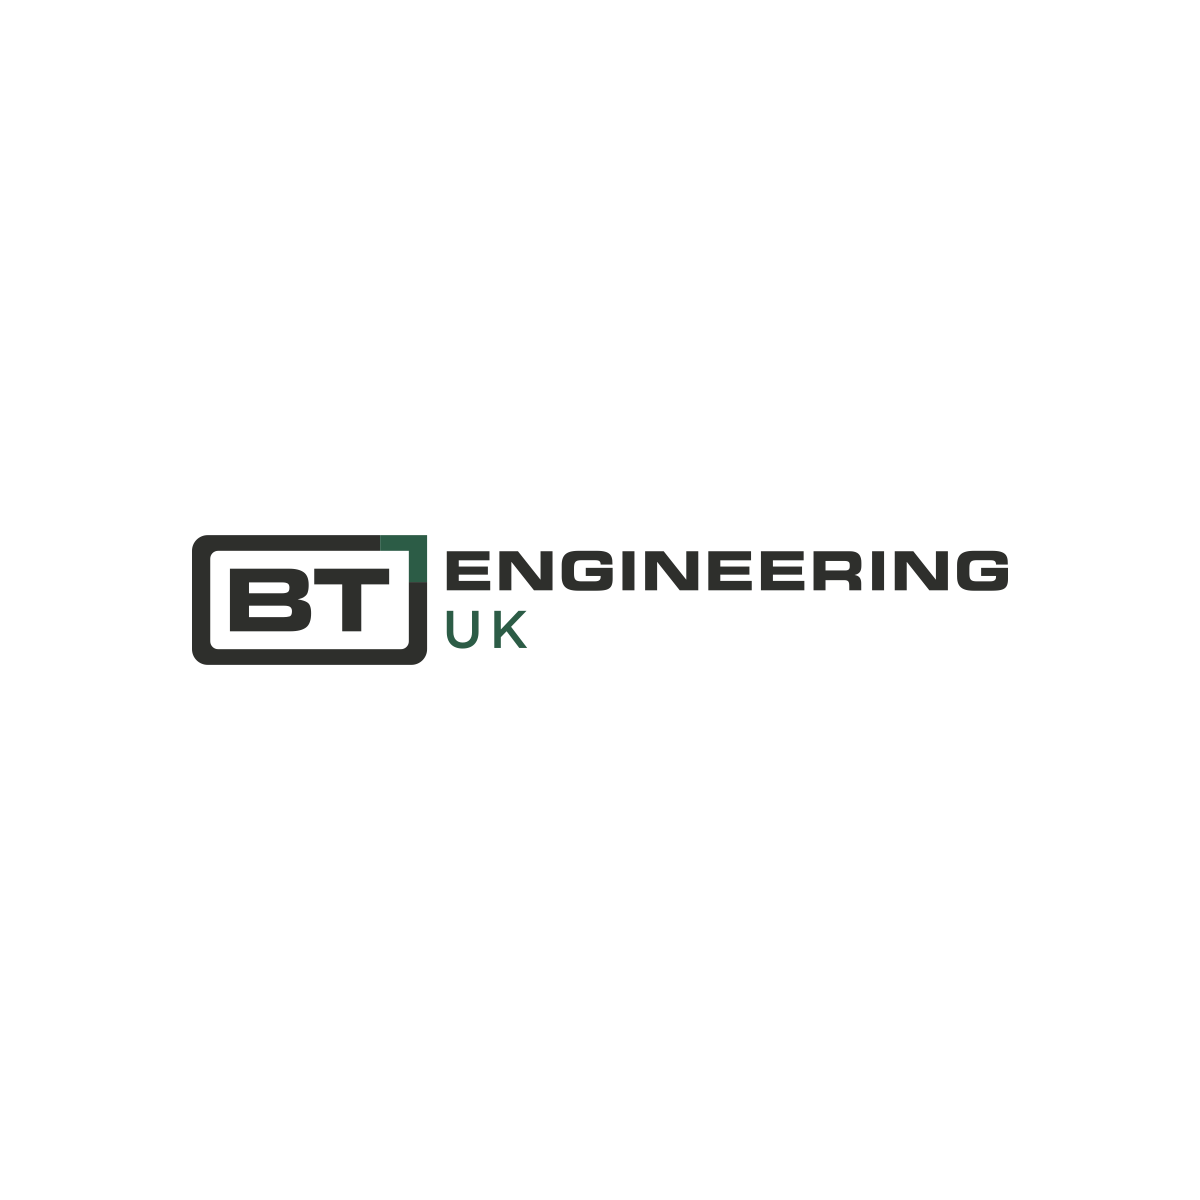 Simple logo alteration